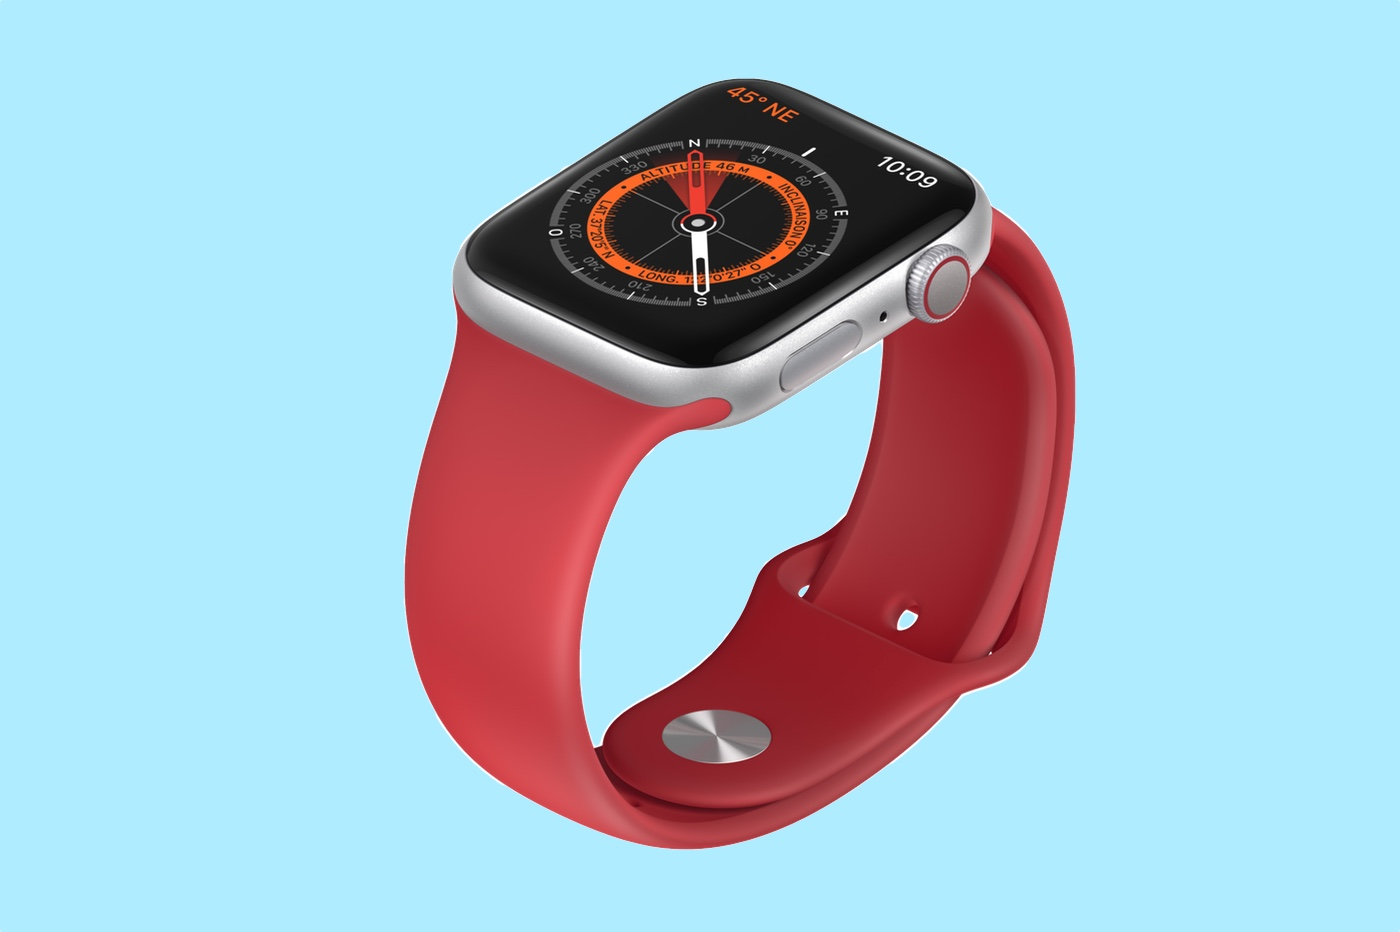 Boussole de l'Apple Watch 5